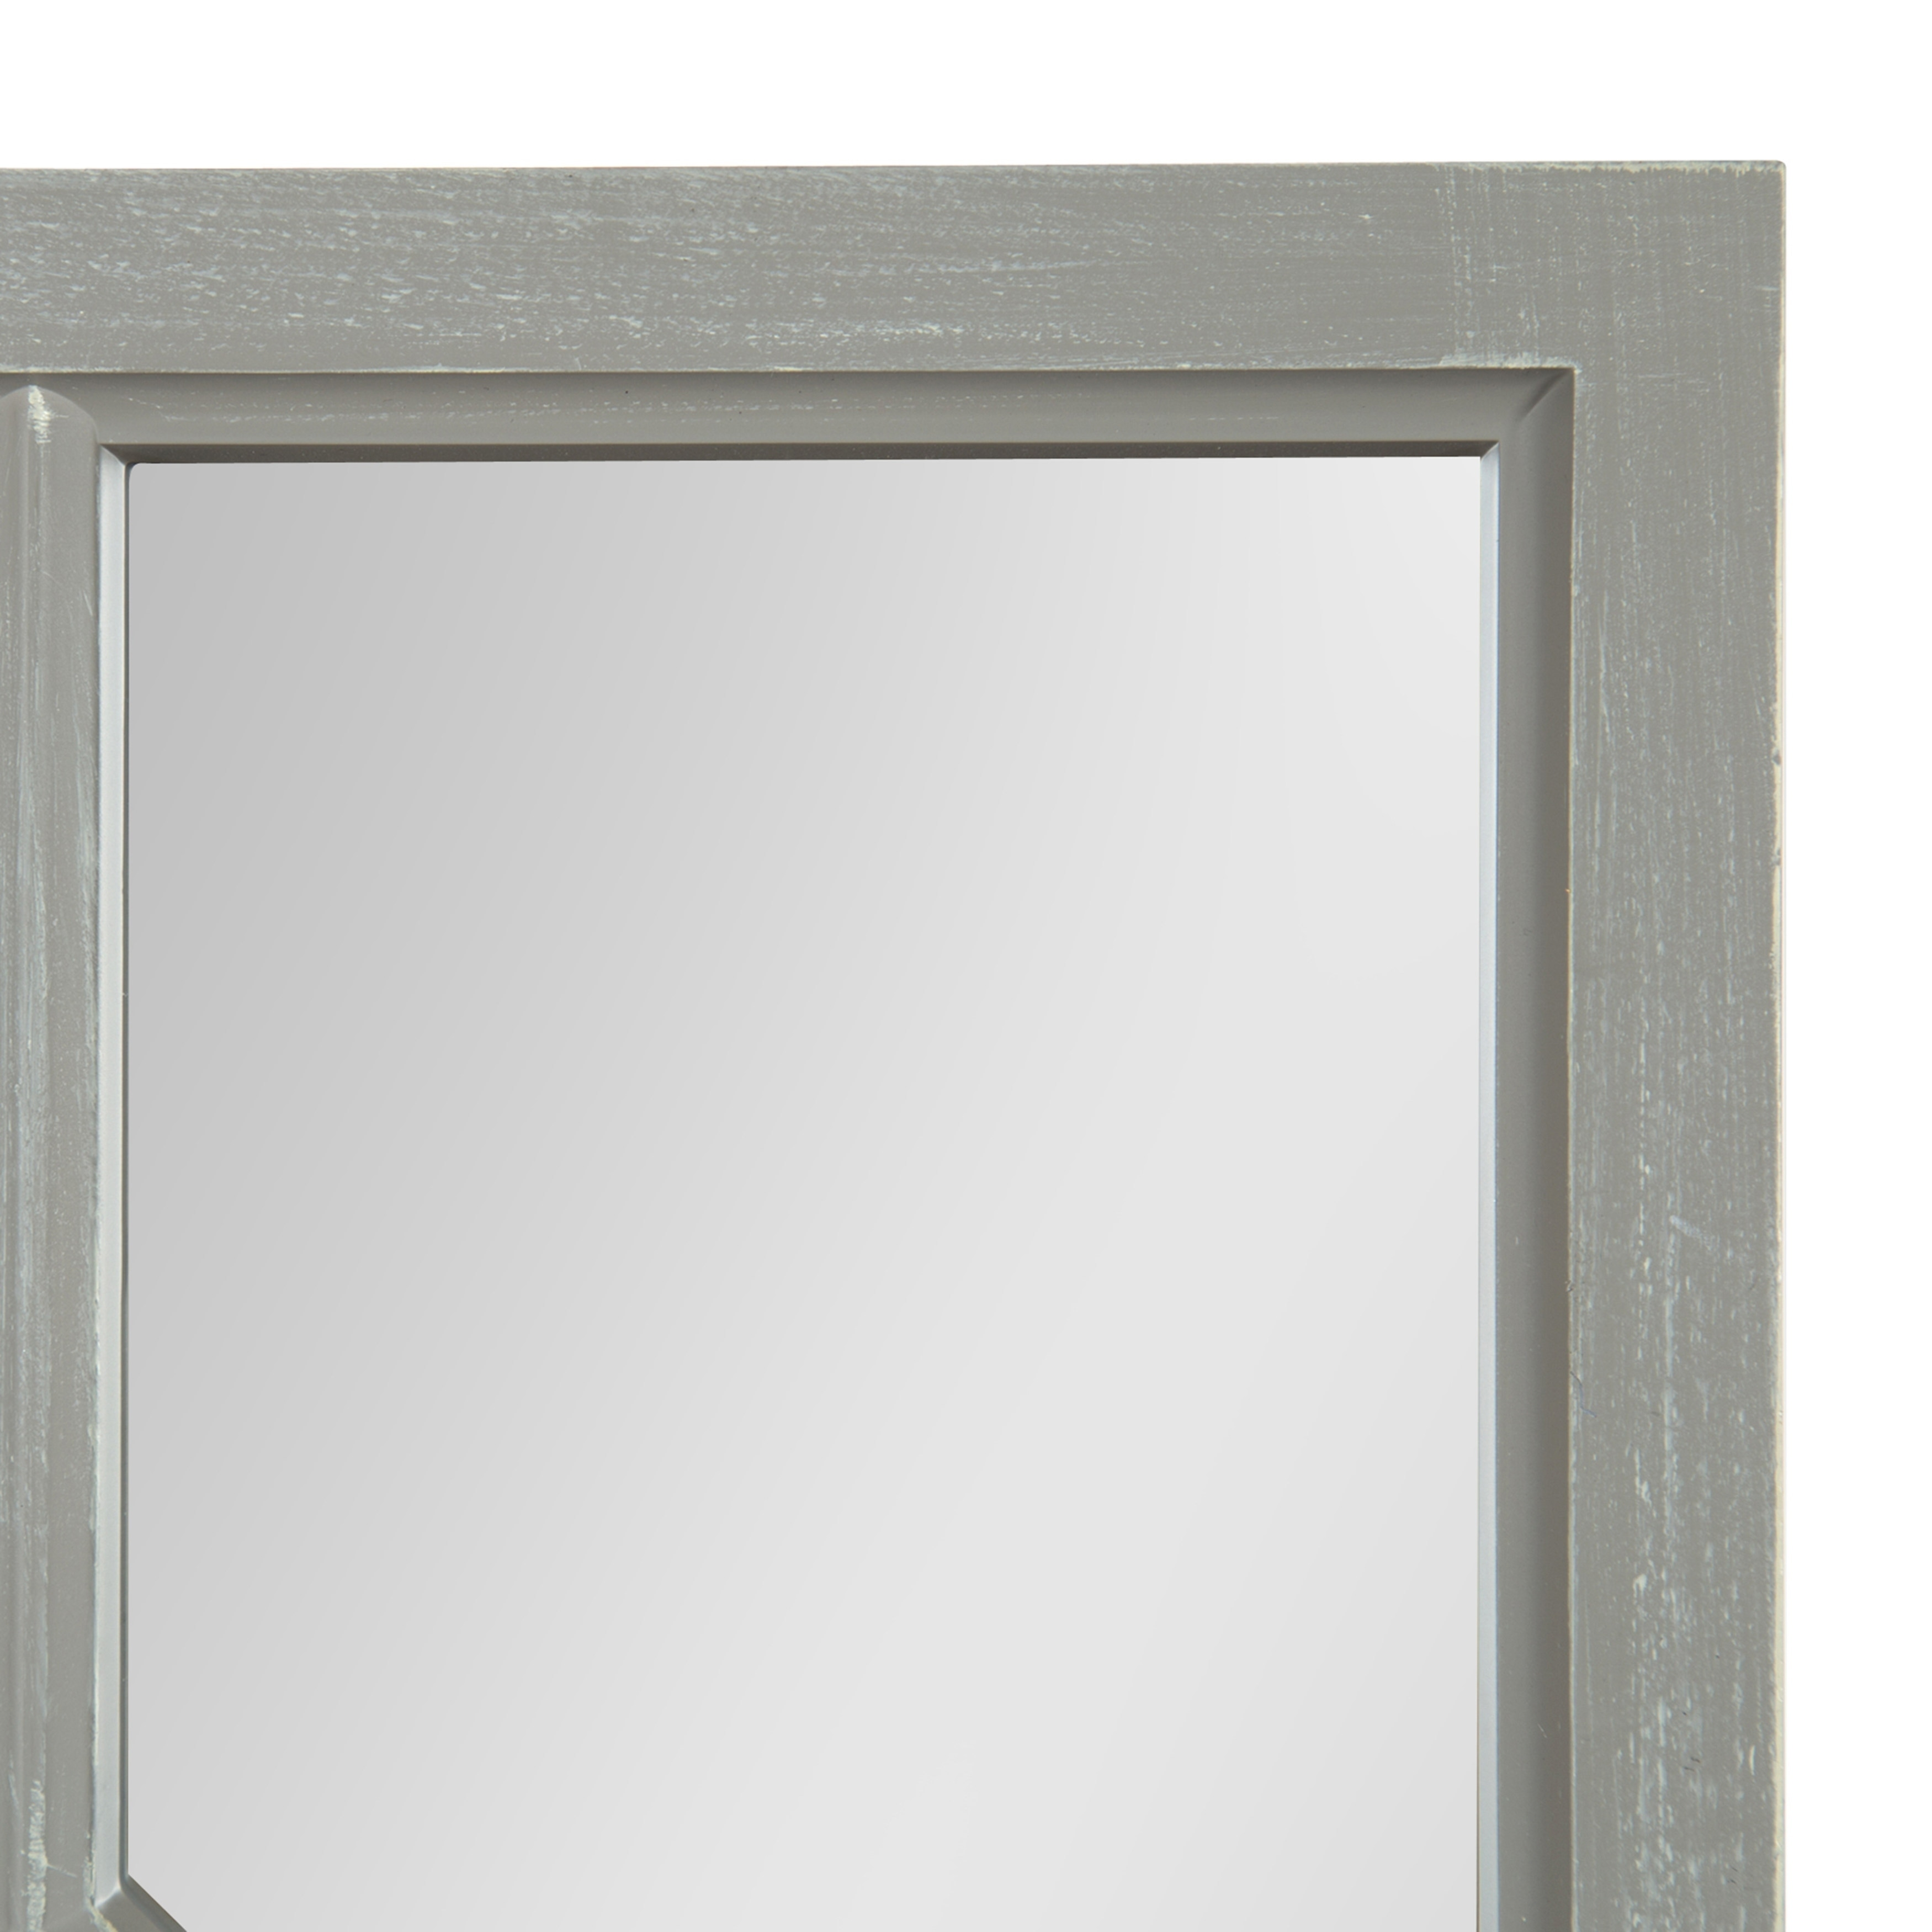 Kate And Laurel Cassat Window Wall Accent Mirror 13x30 Overstock 16935316